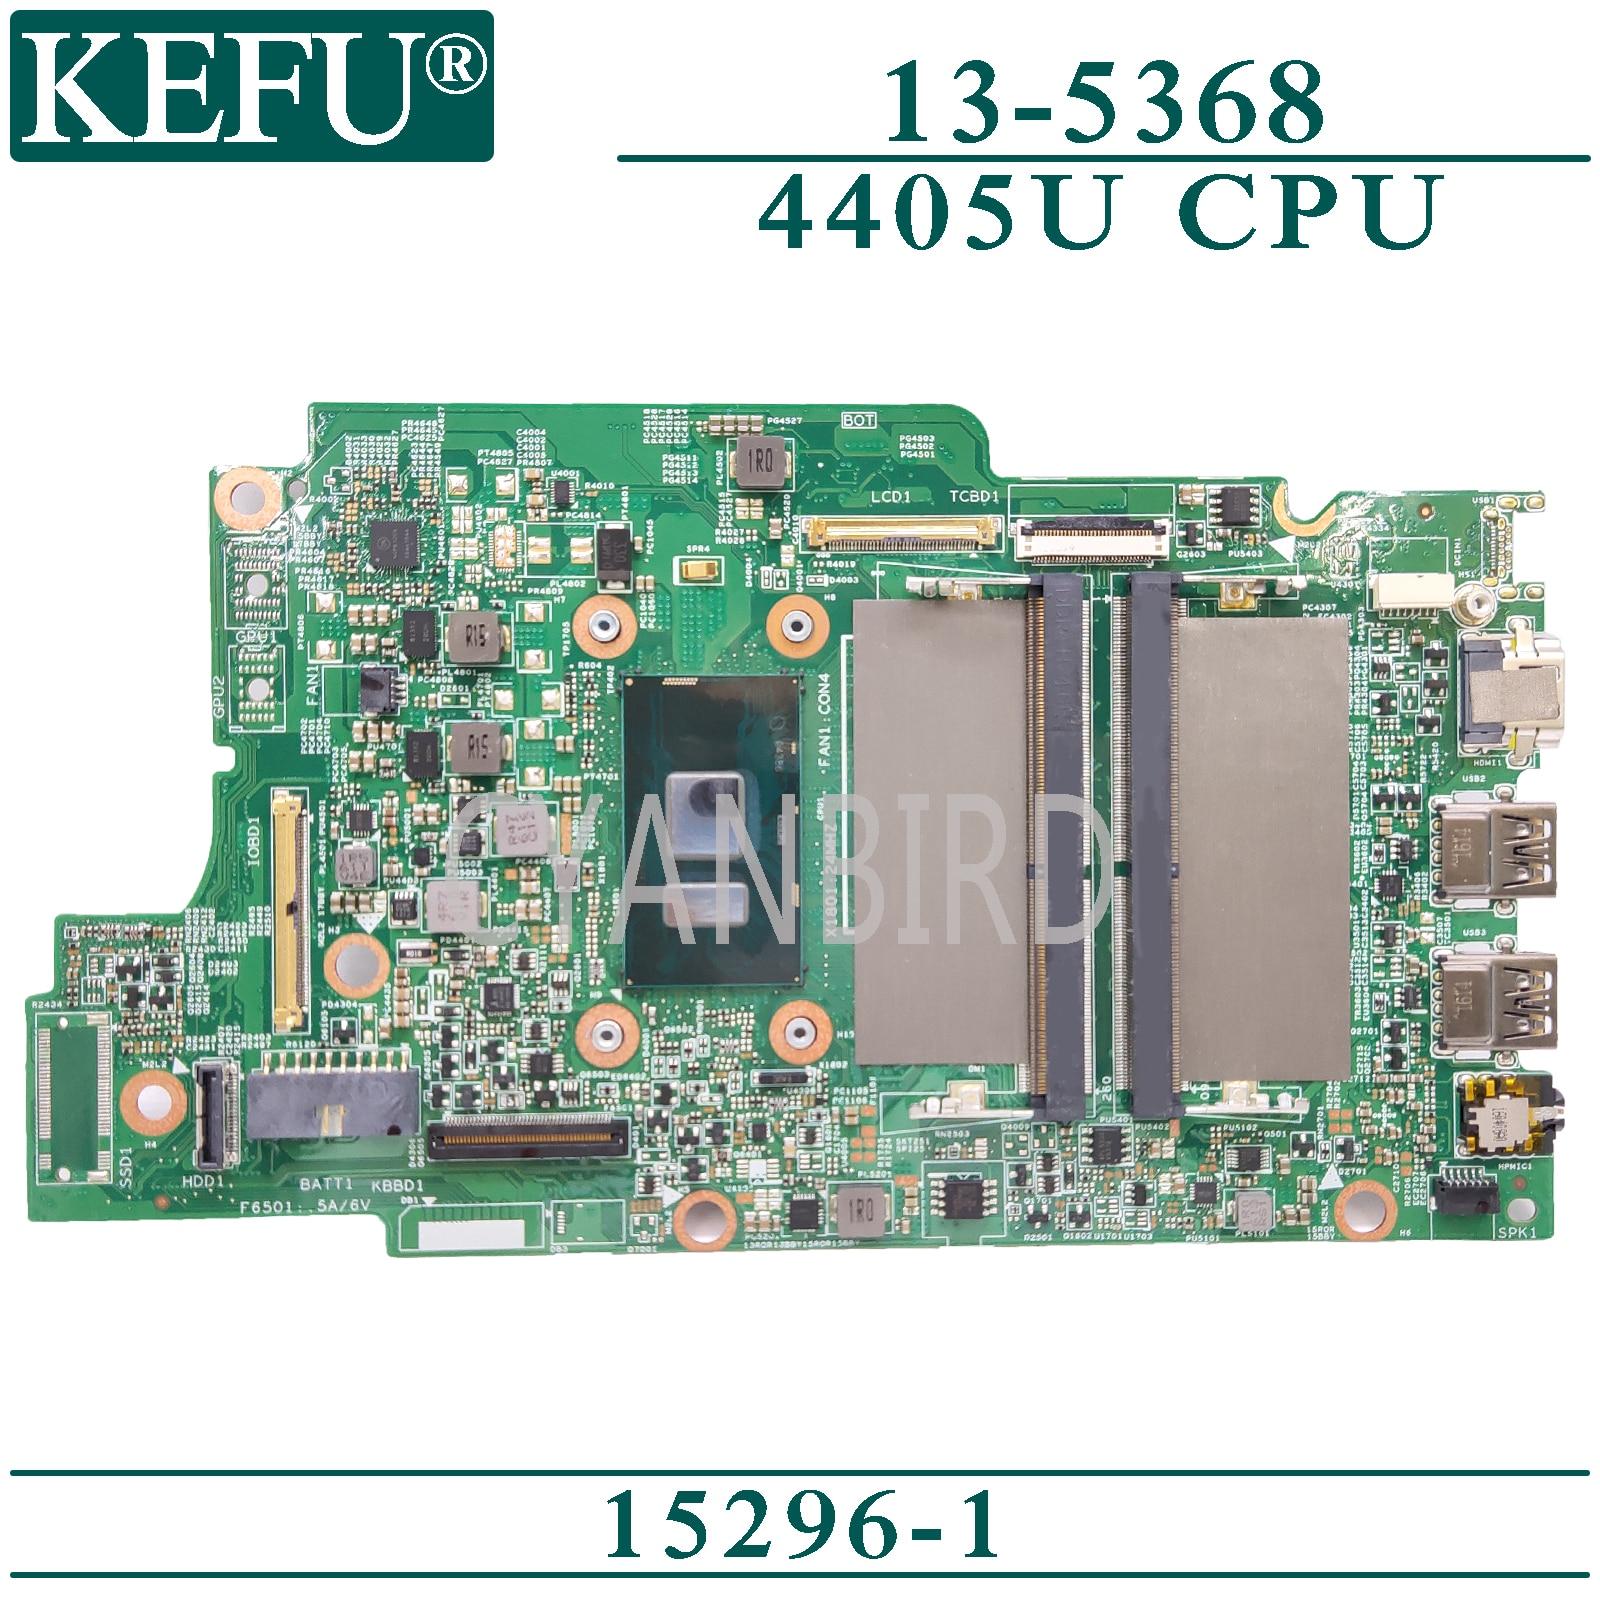 KEFU 15296-1 لوحة رئيسية أصلية لأجهزة الكمبيوتر المحمول Dell Inspiron 13-5368 مع 4405U